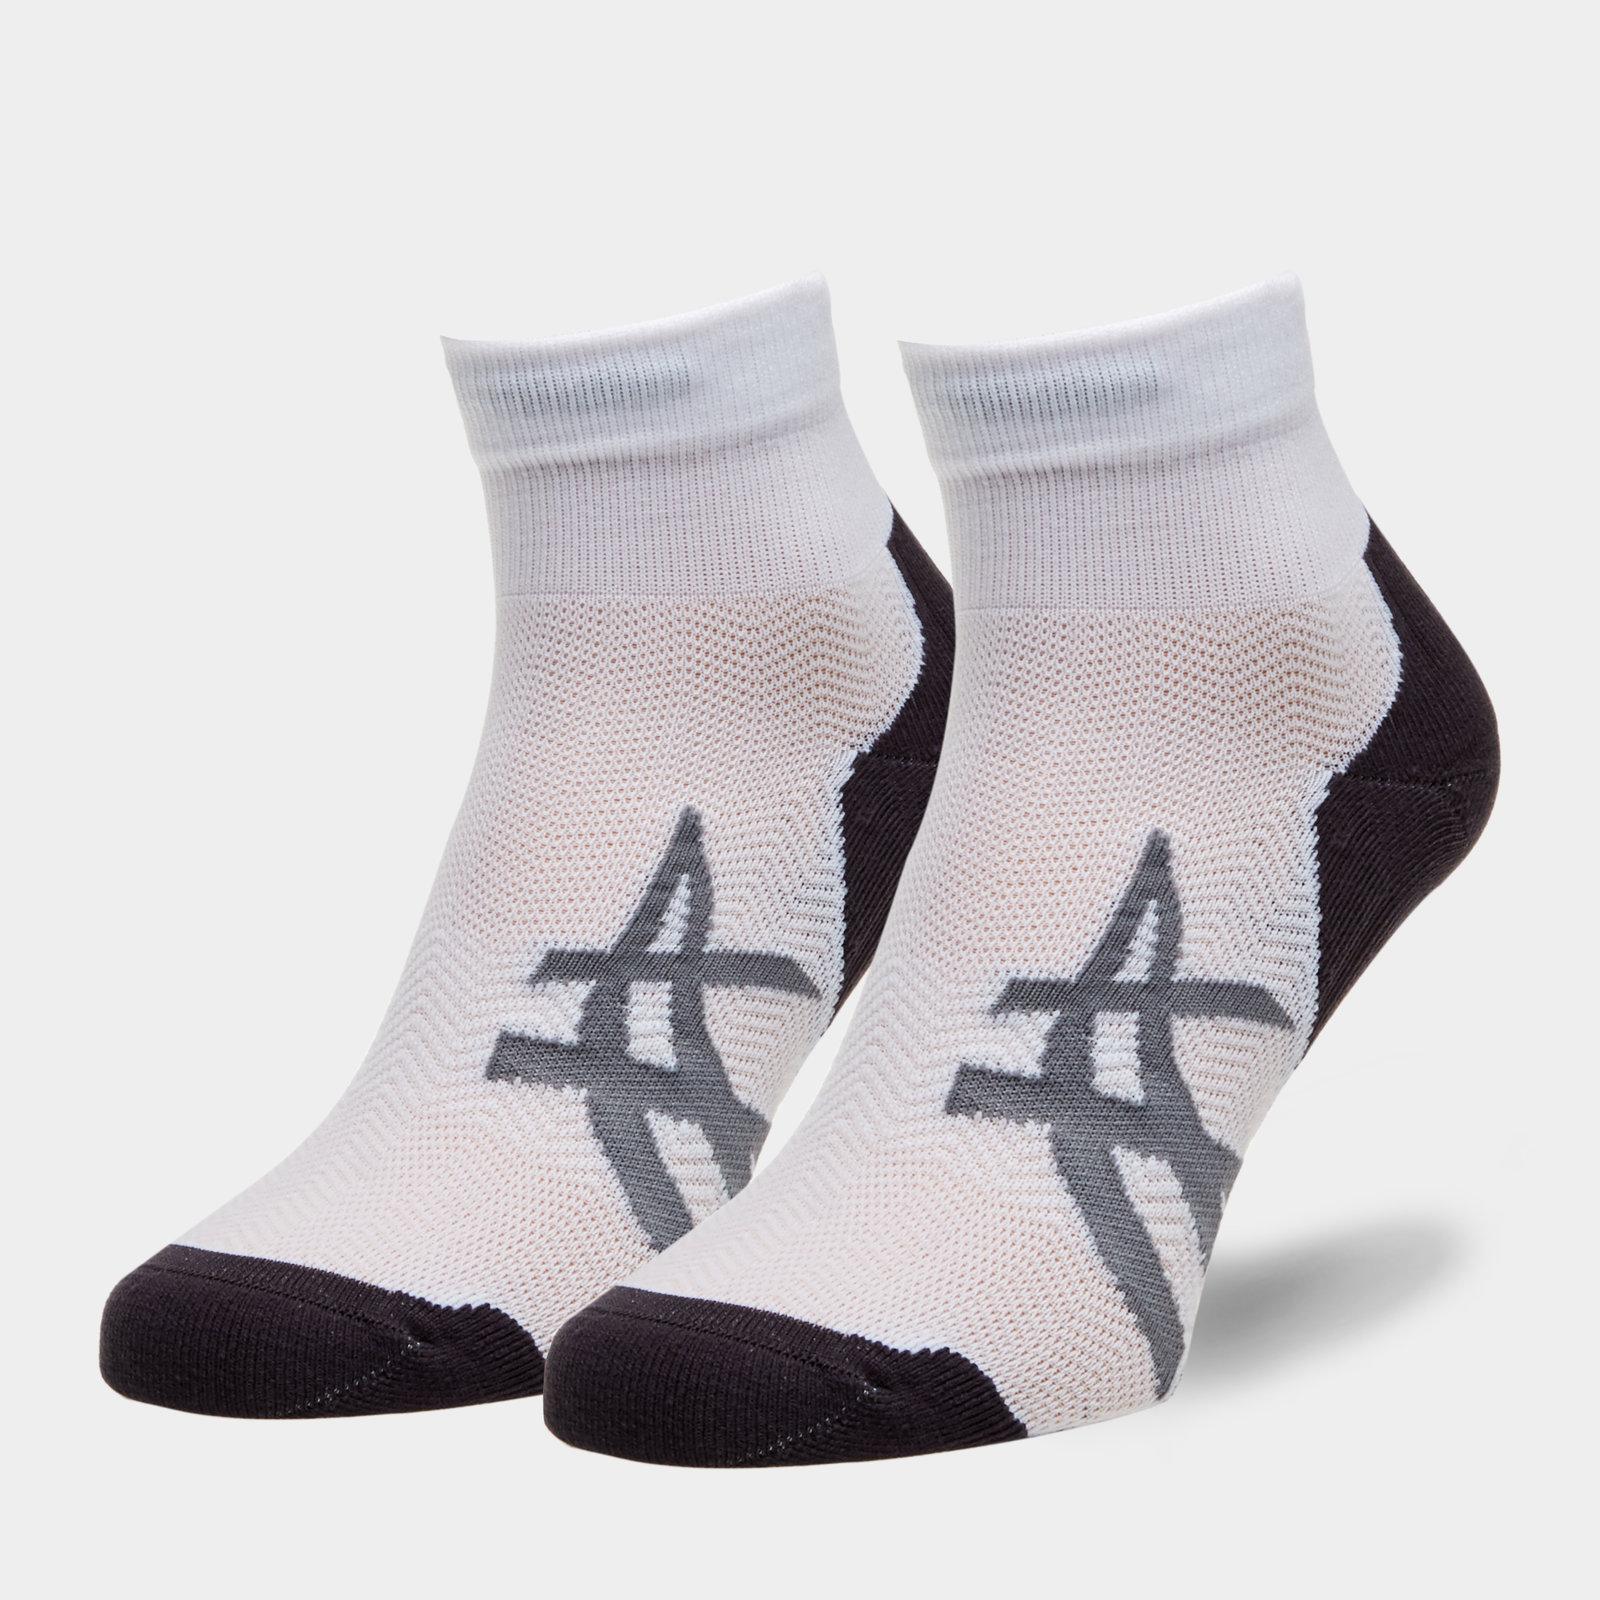 Image of 2 Pack Cushioned Socks